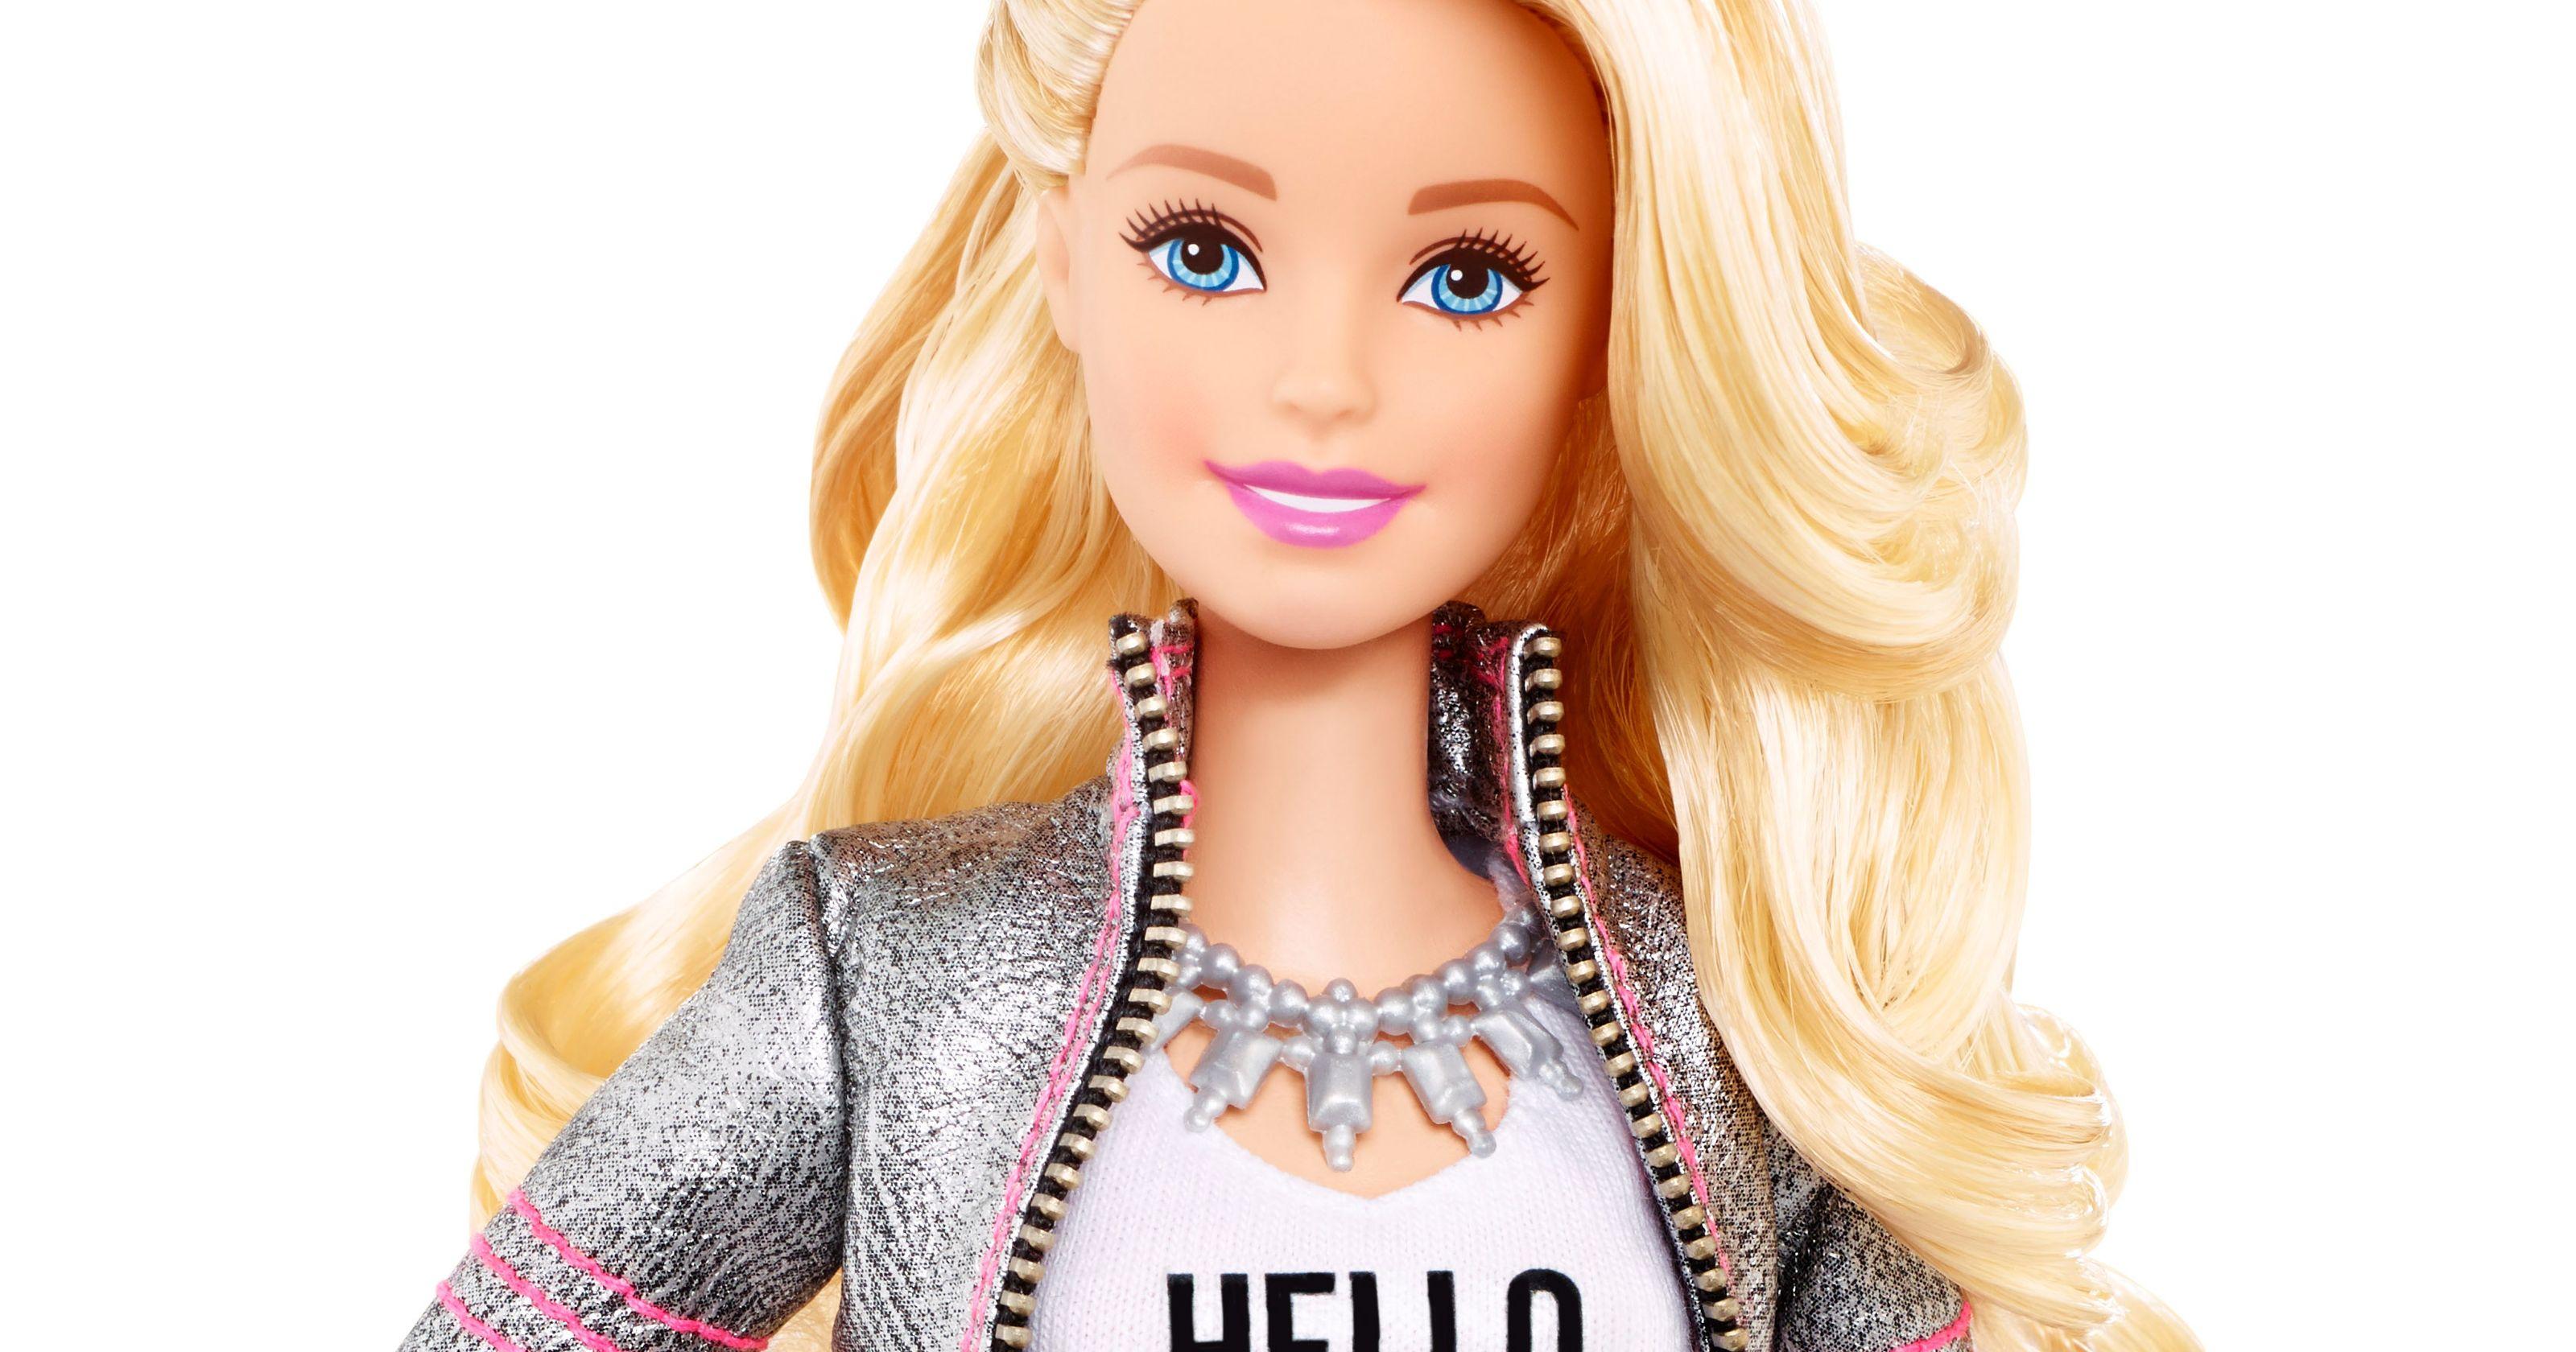 barbie doll beauty u0027 a poem about unrealistic beauty standards